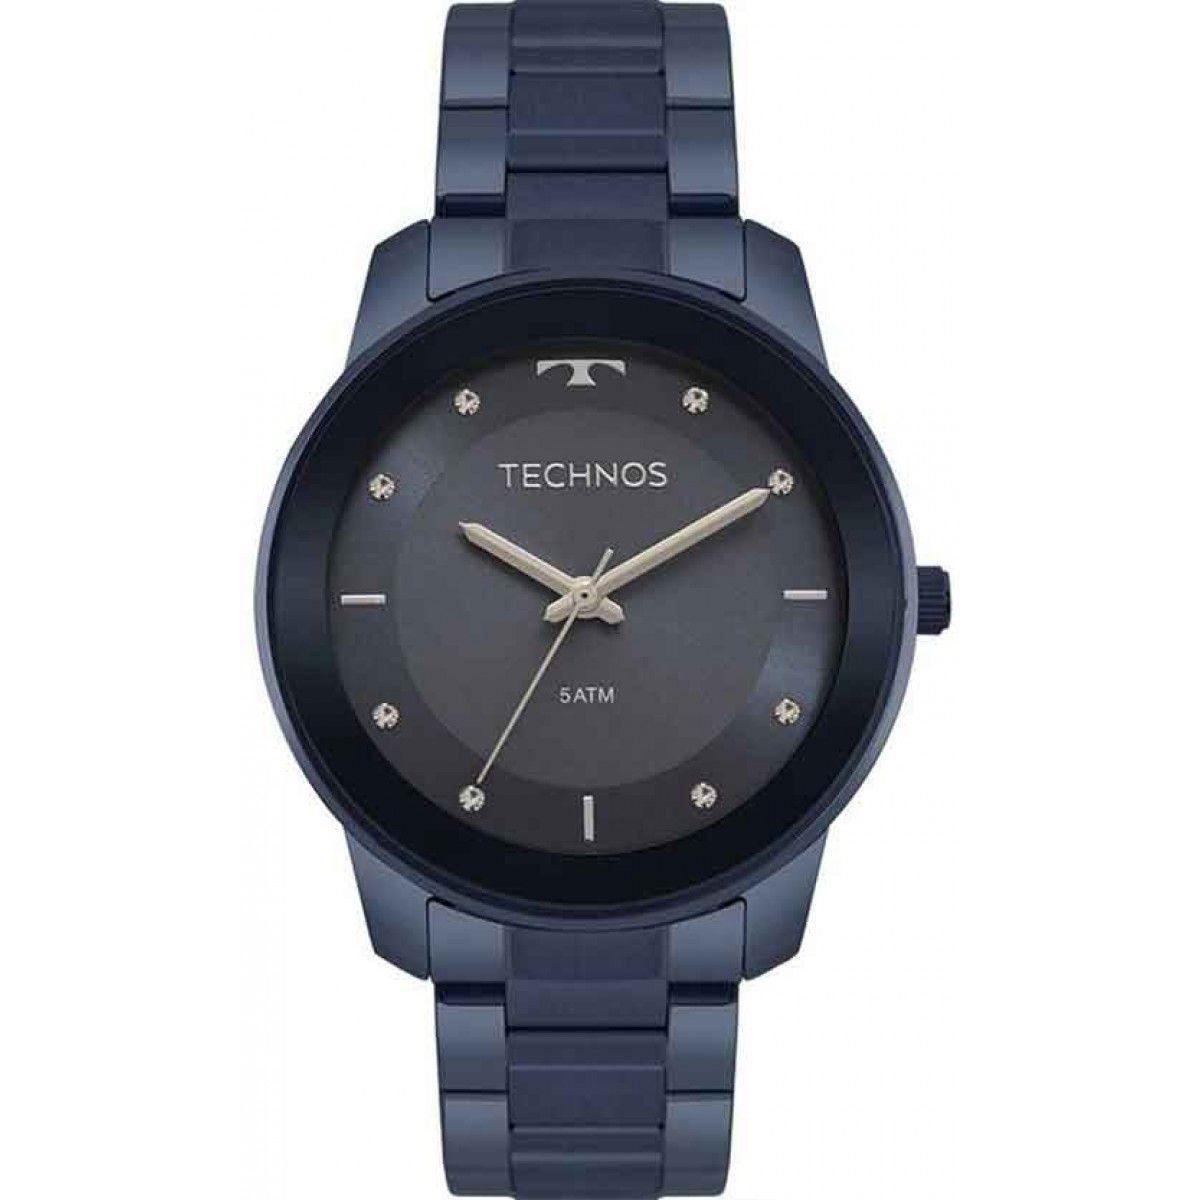 e24c0851205 Relógio Technos Fashion Trend Azul Feminino 2036MKE 4A - Relógio ...